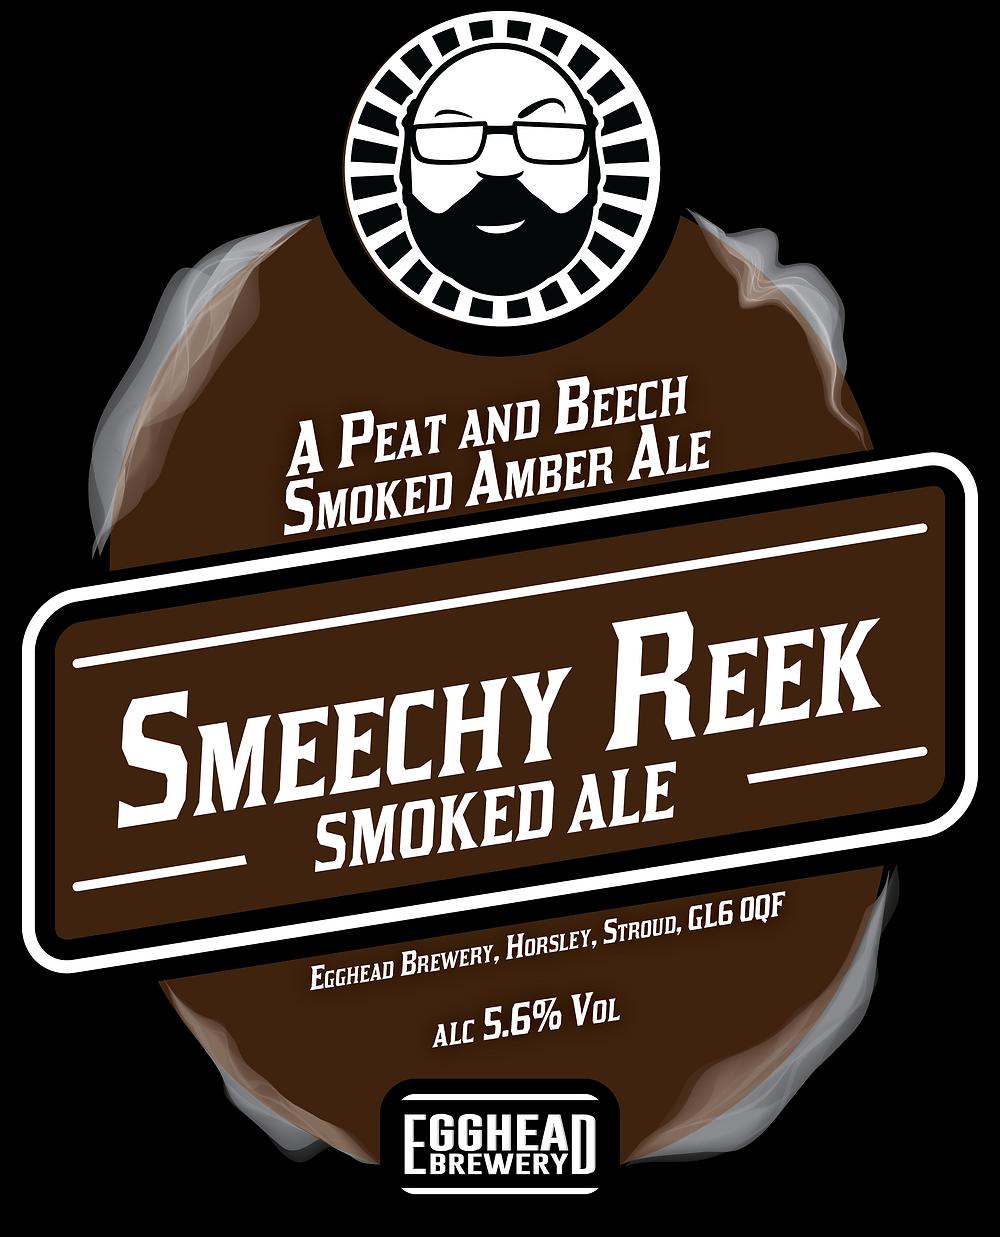 SmeechyReek.png